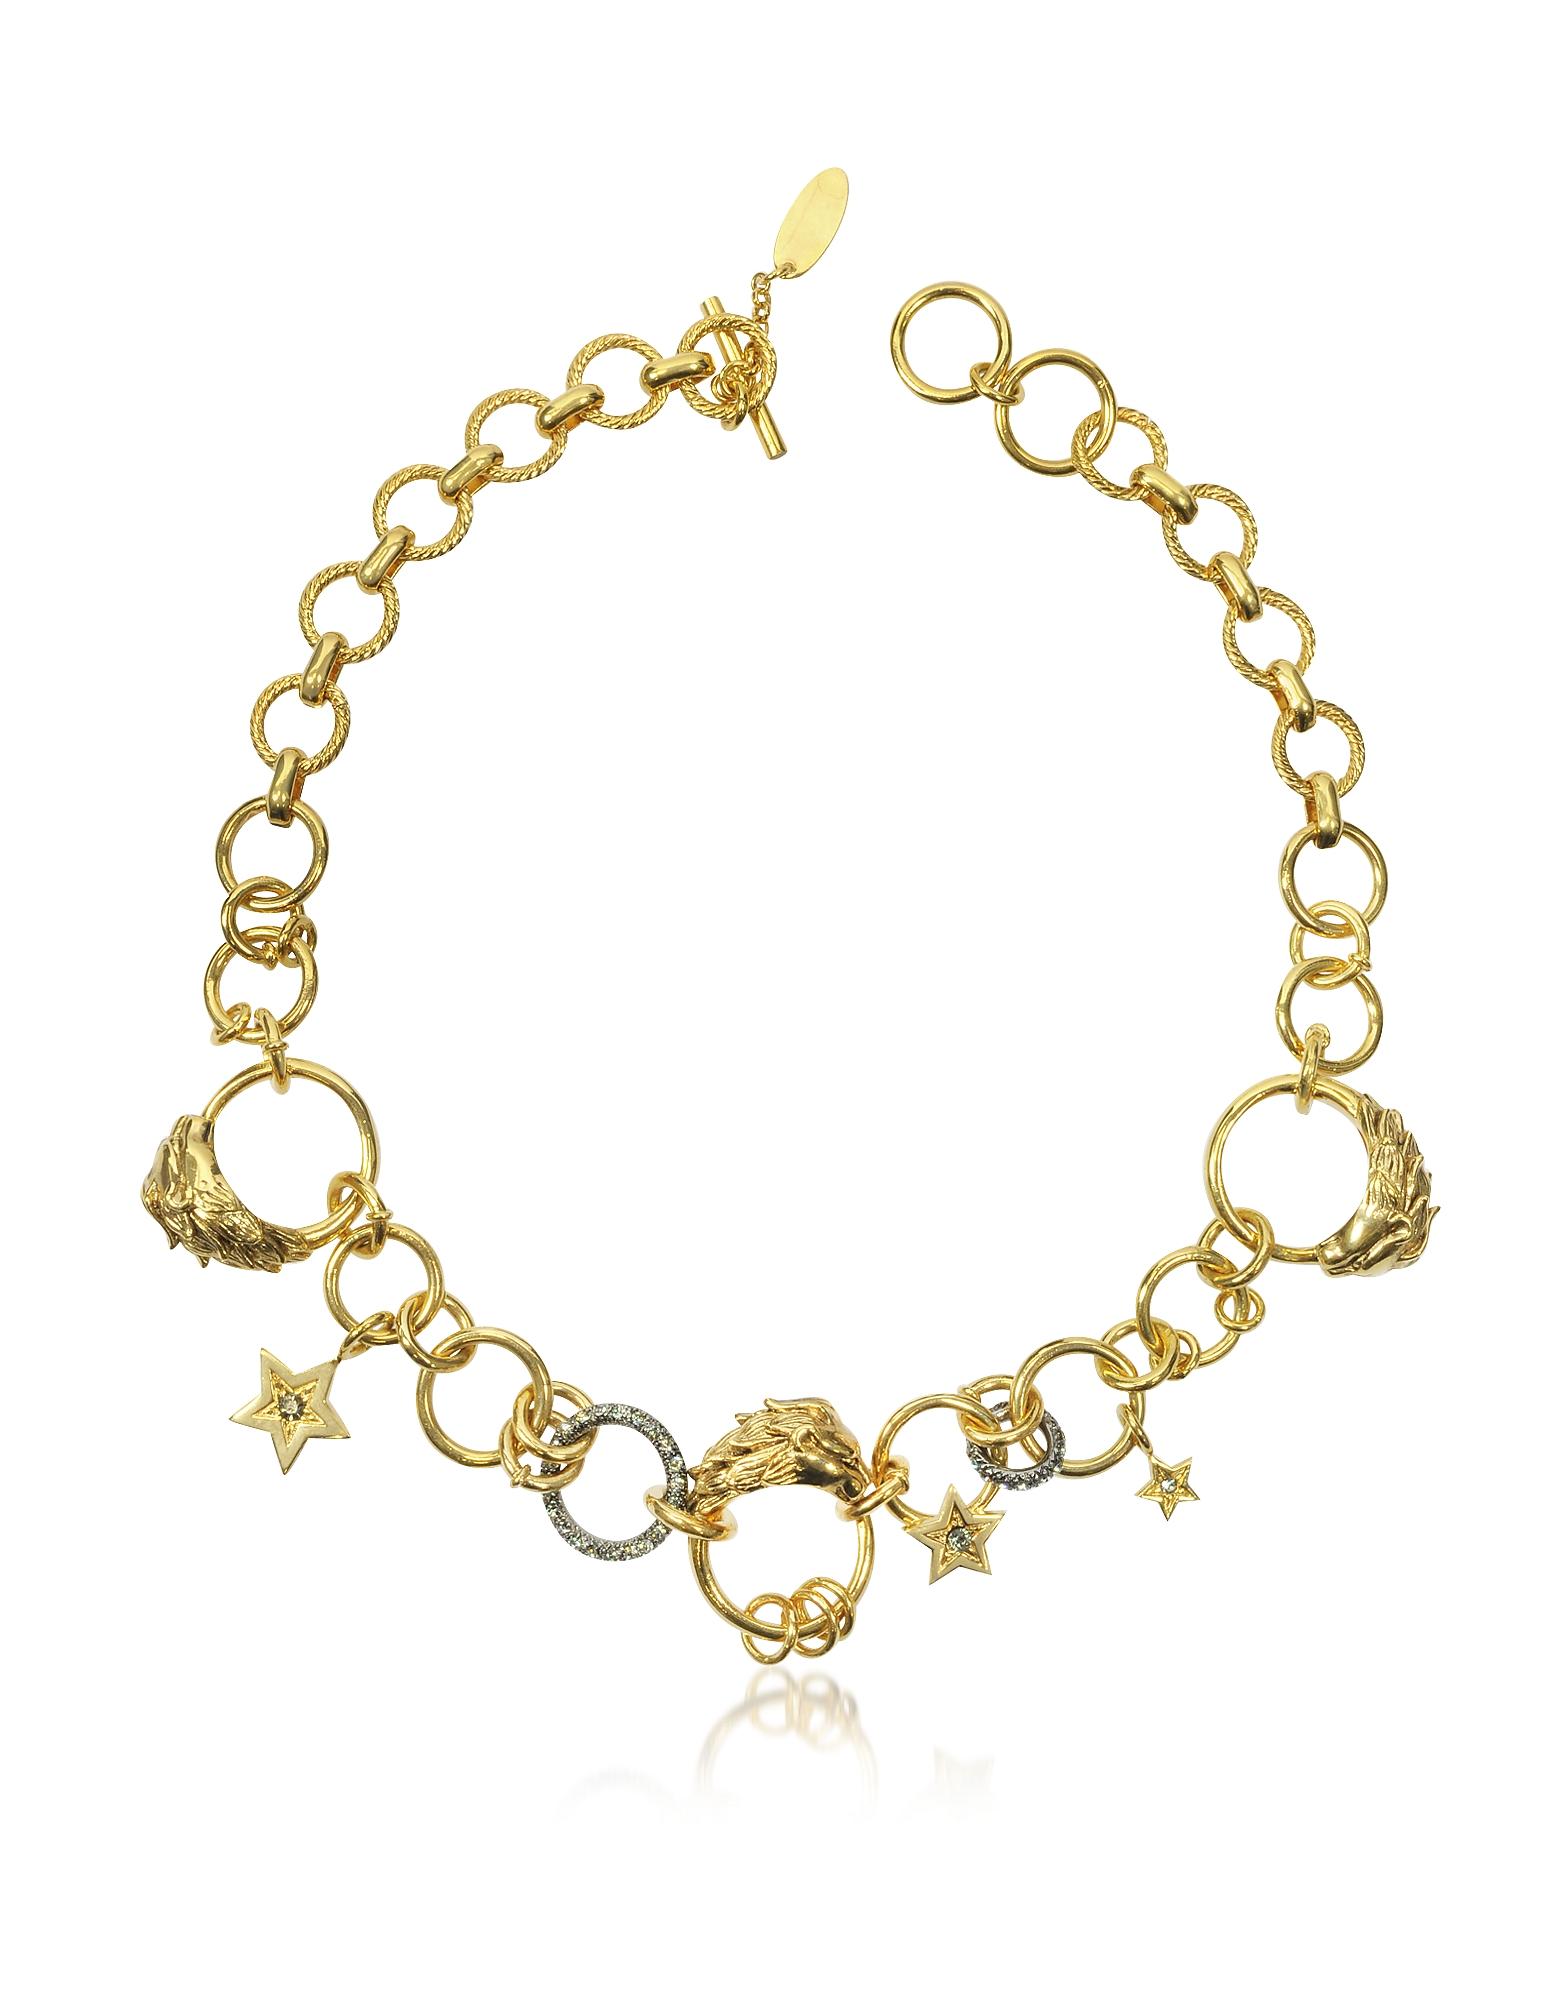 Roberto Cavalli Circus - Золотистое Металлическое Ожерелье с Кристаллами